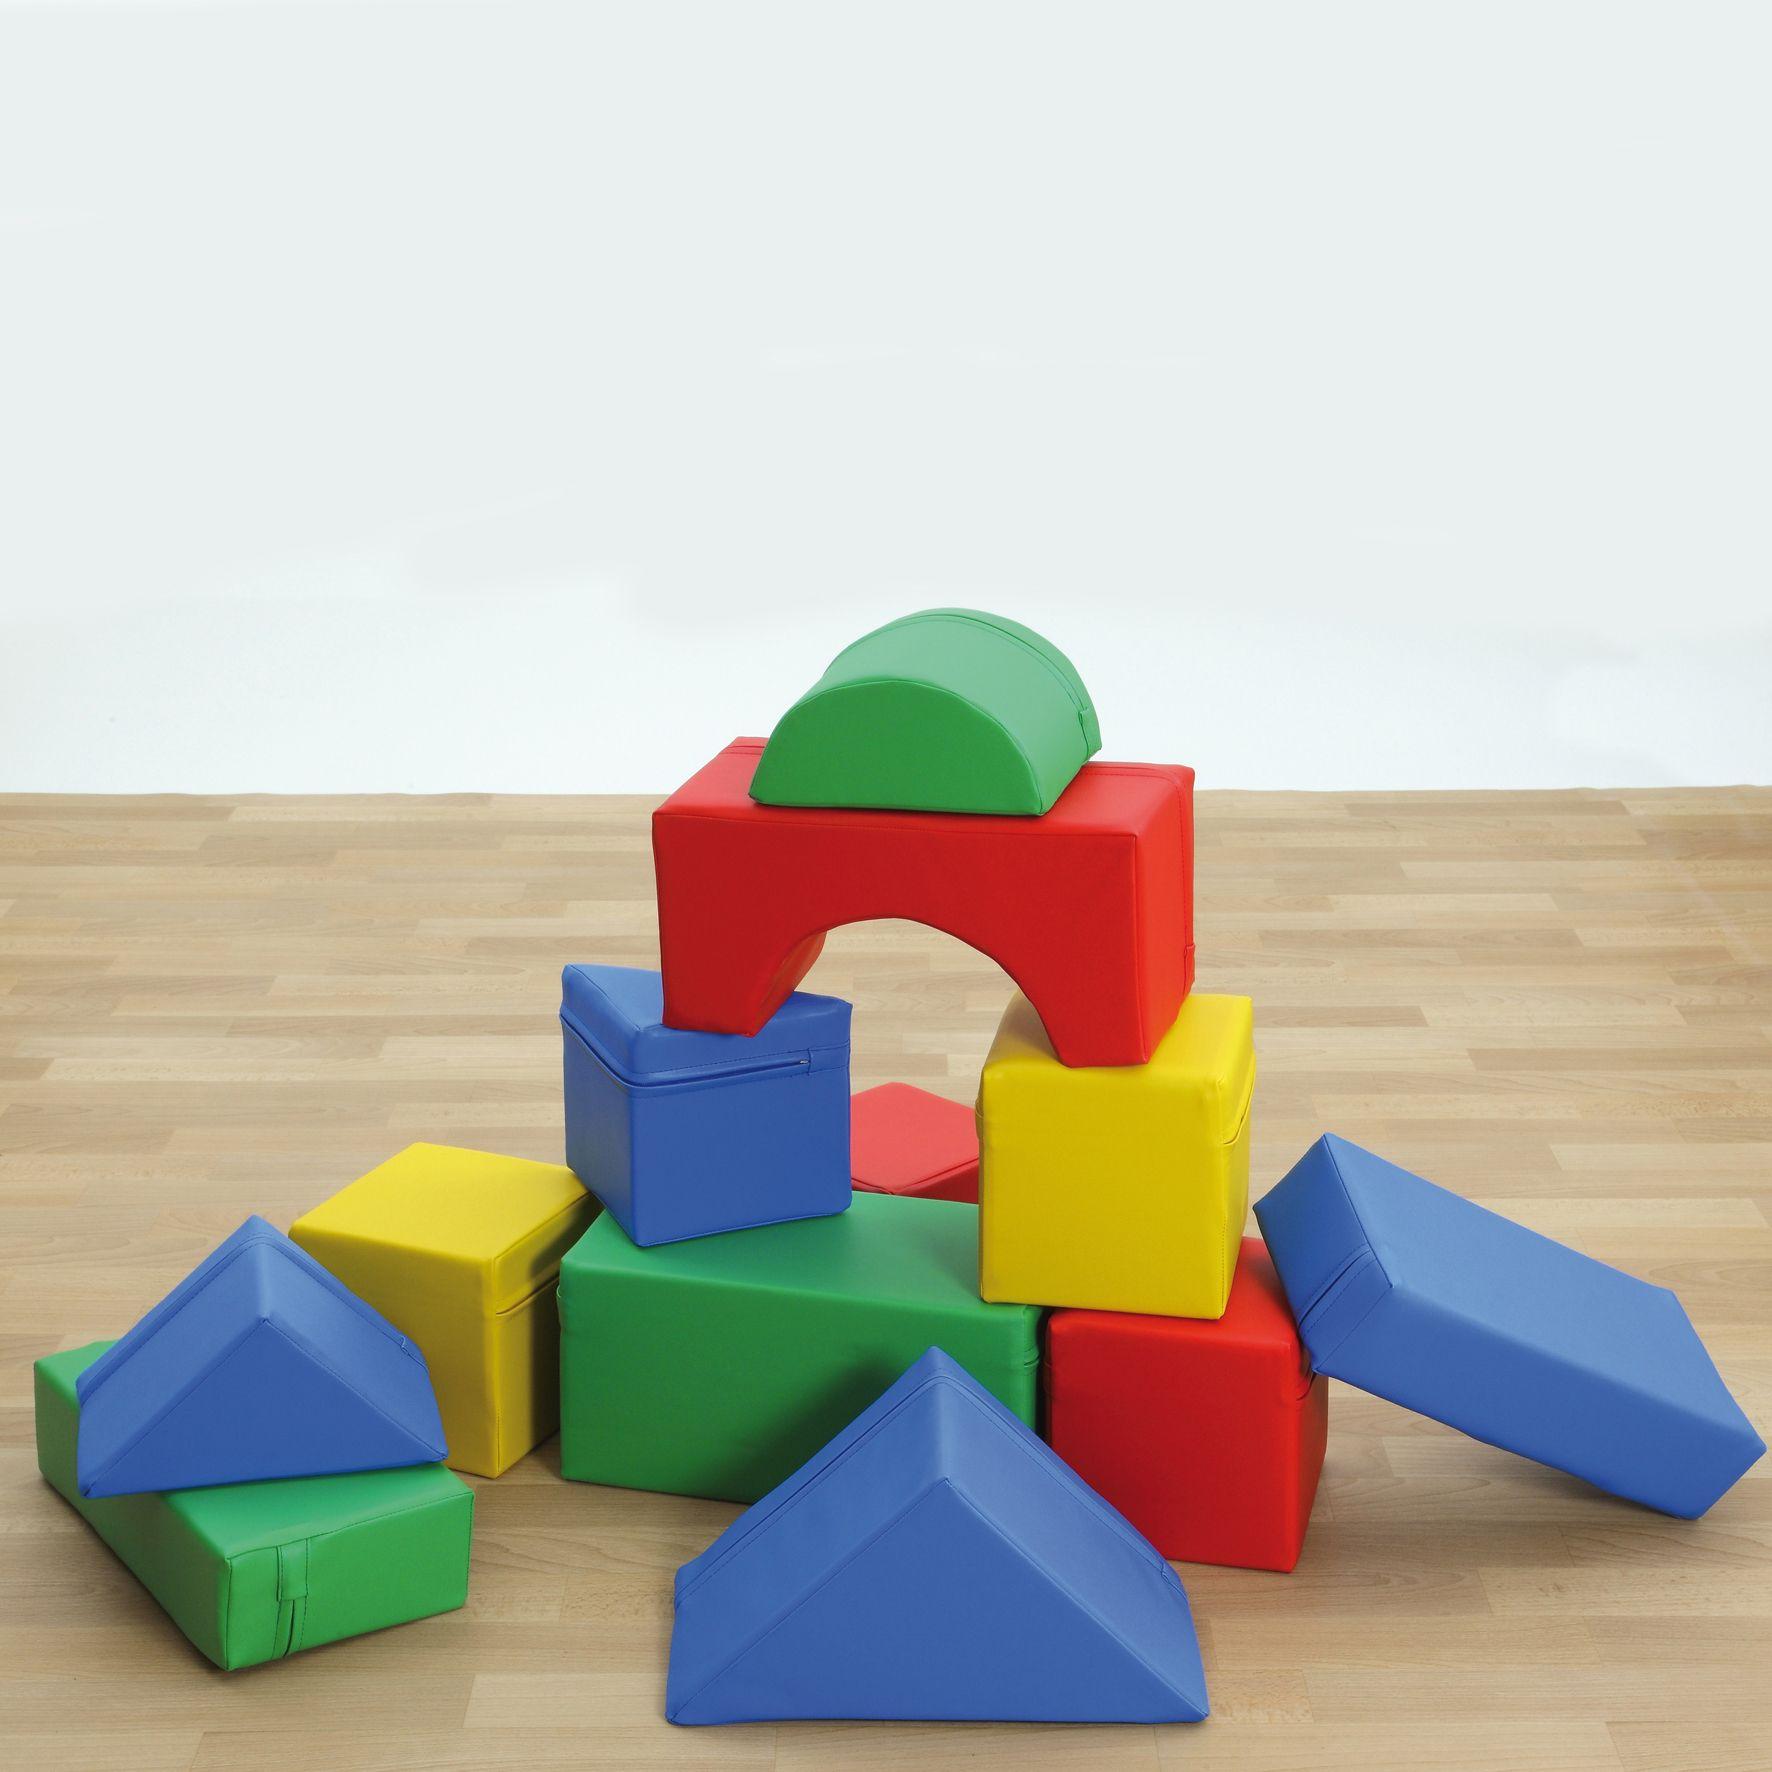 Konstruktionsspiel